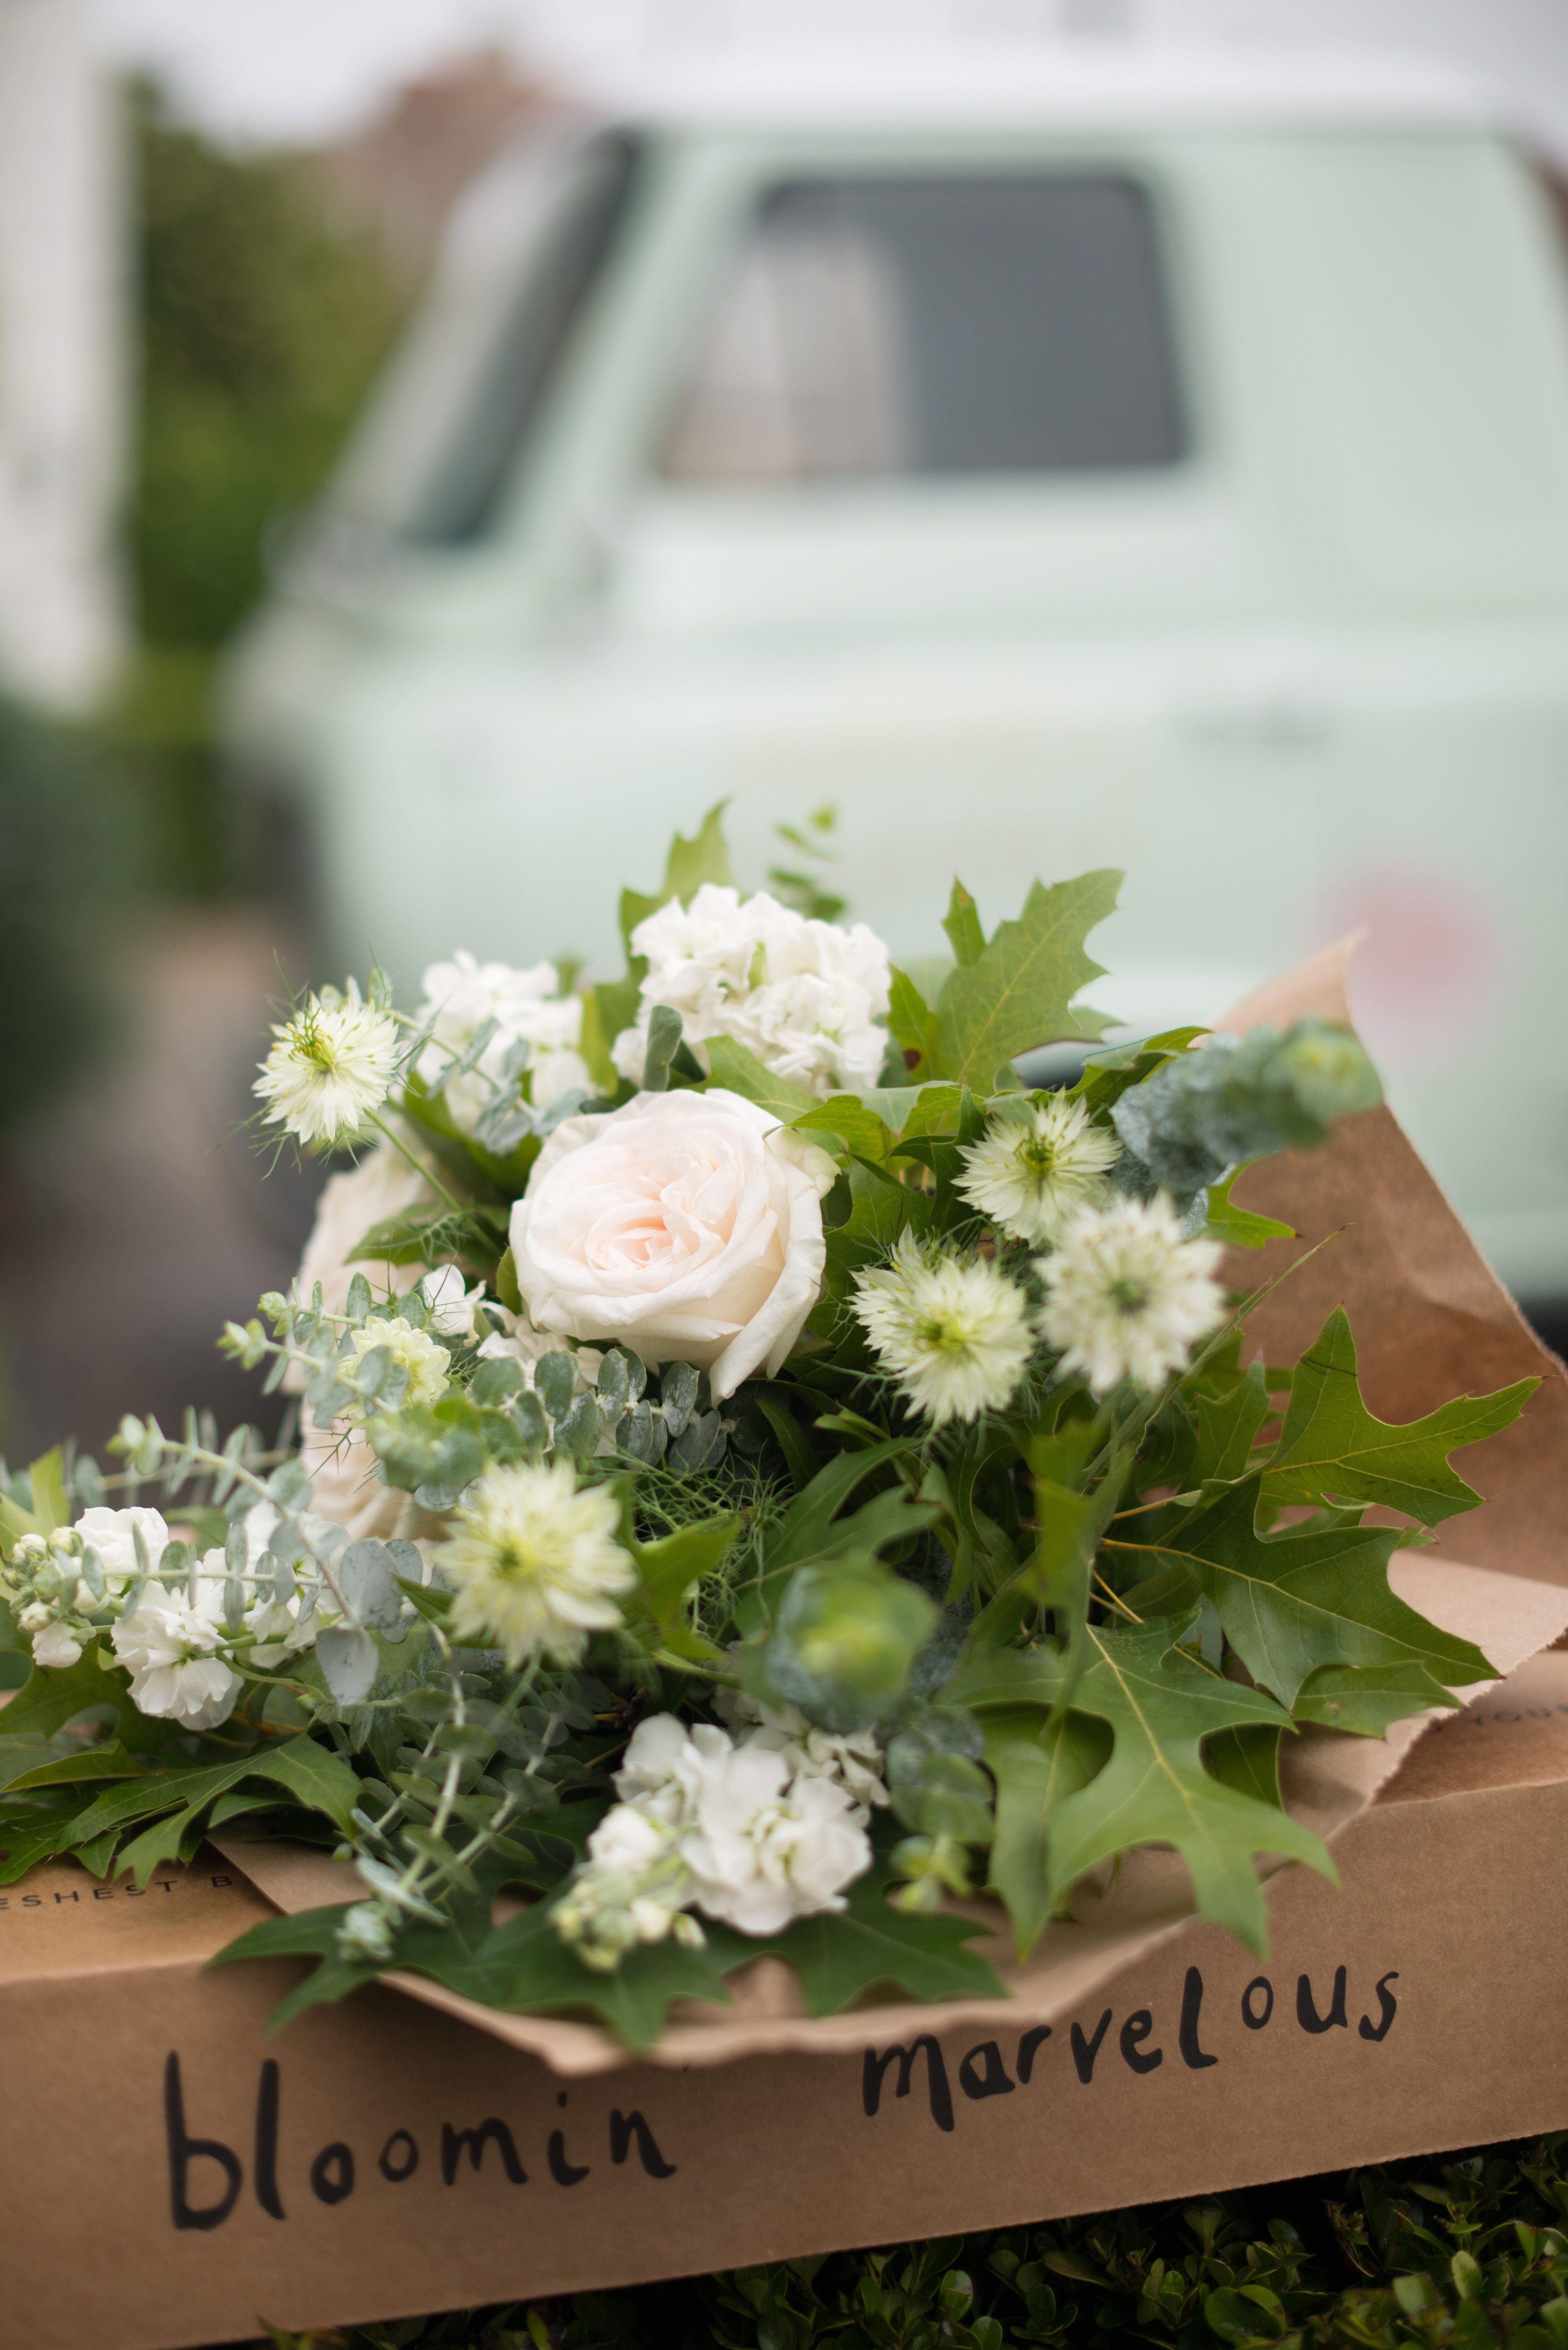 Bloom Box Flowers Build Your Own Flower Arrangement Flowerbar